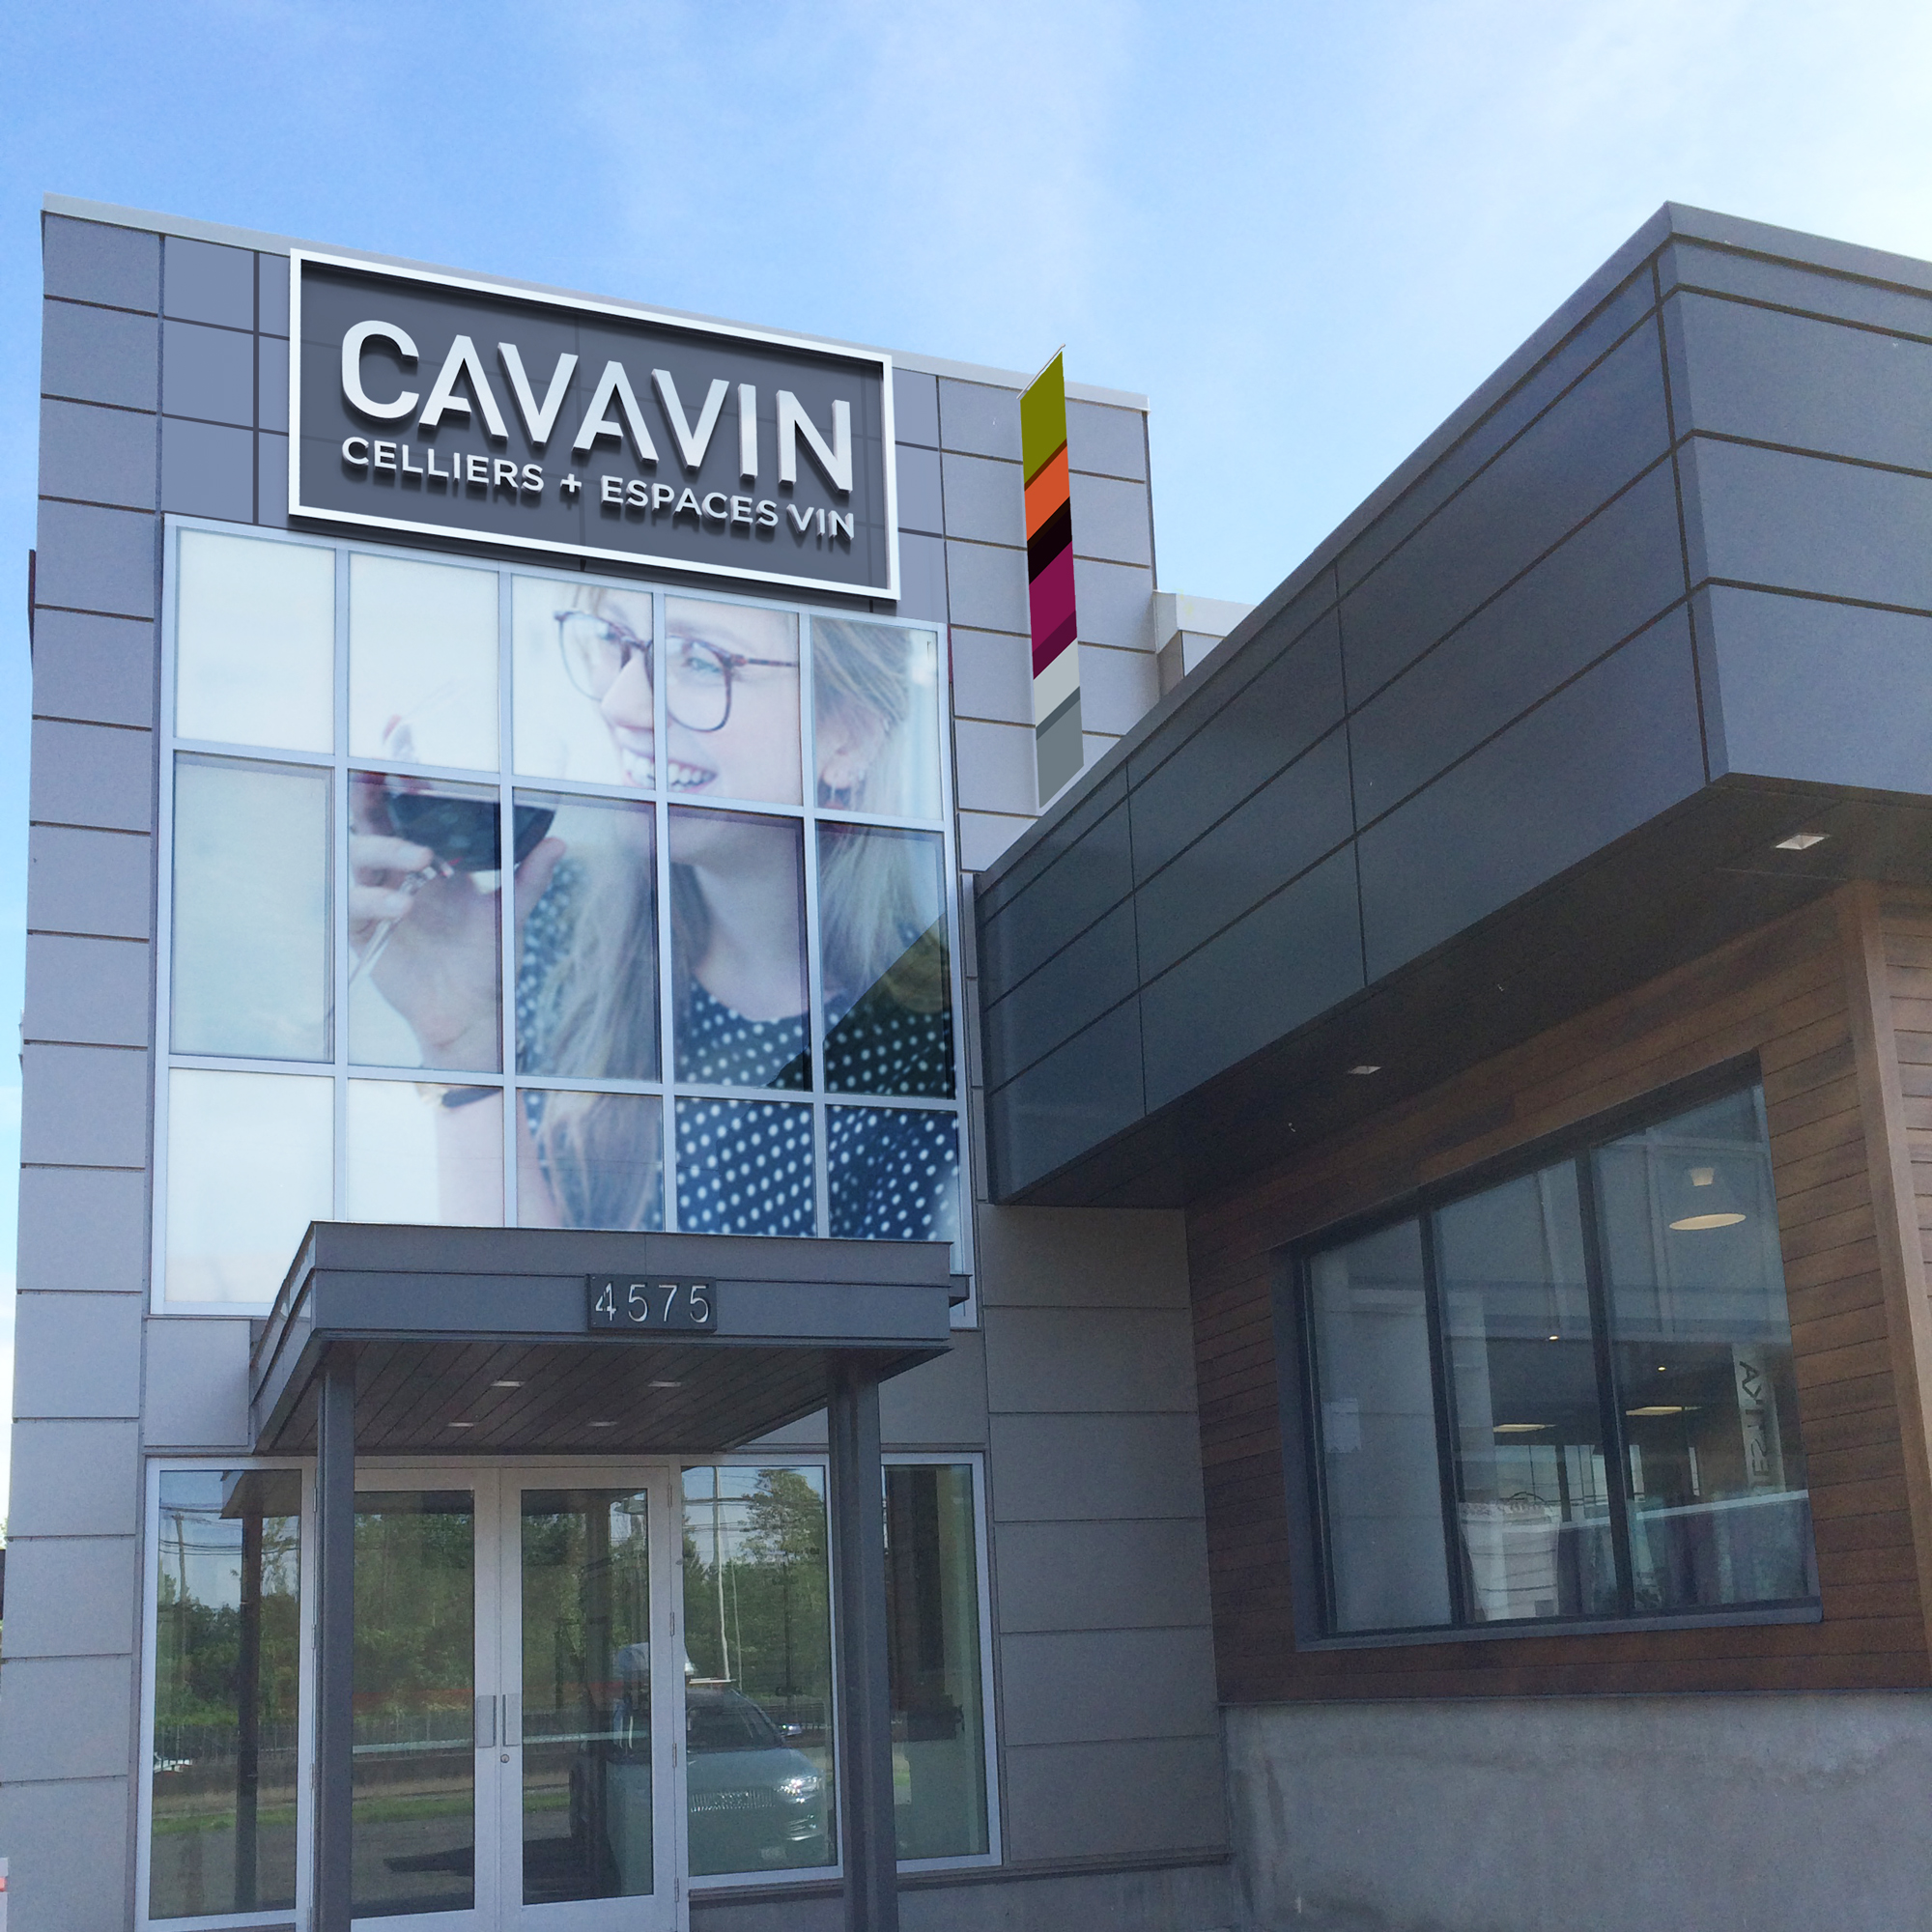 cavavin_siegesocial1